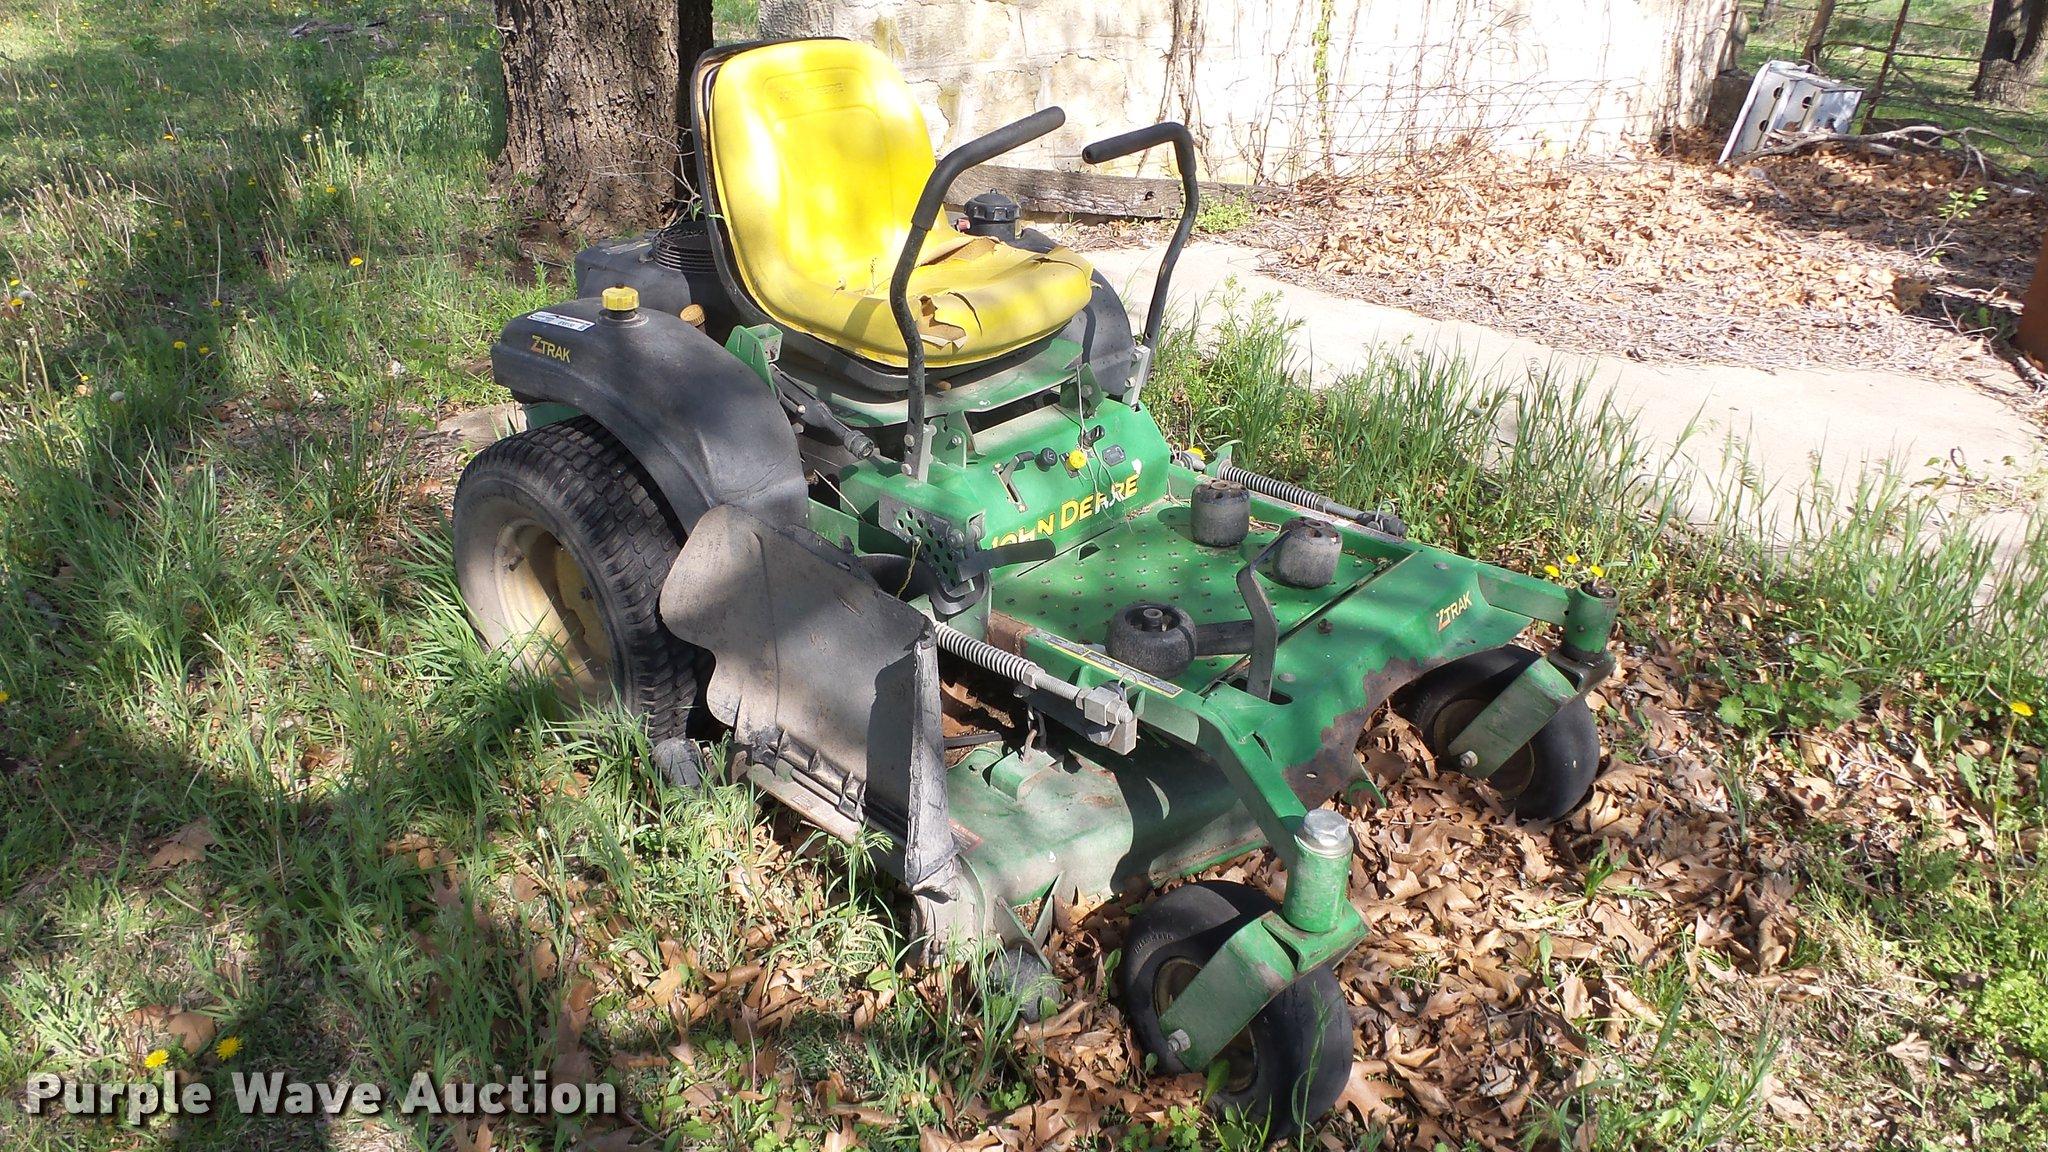 John Deere ZTrak 717A ZTR lawn mower   Item EX9150   SOLD! J